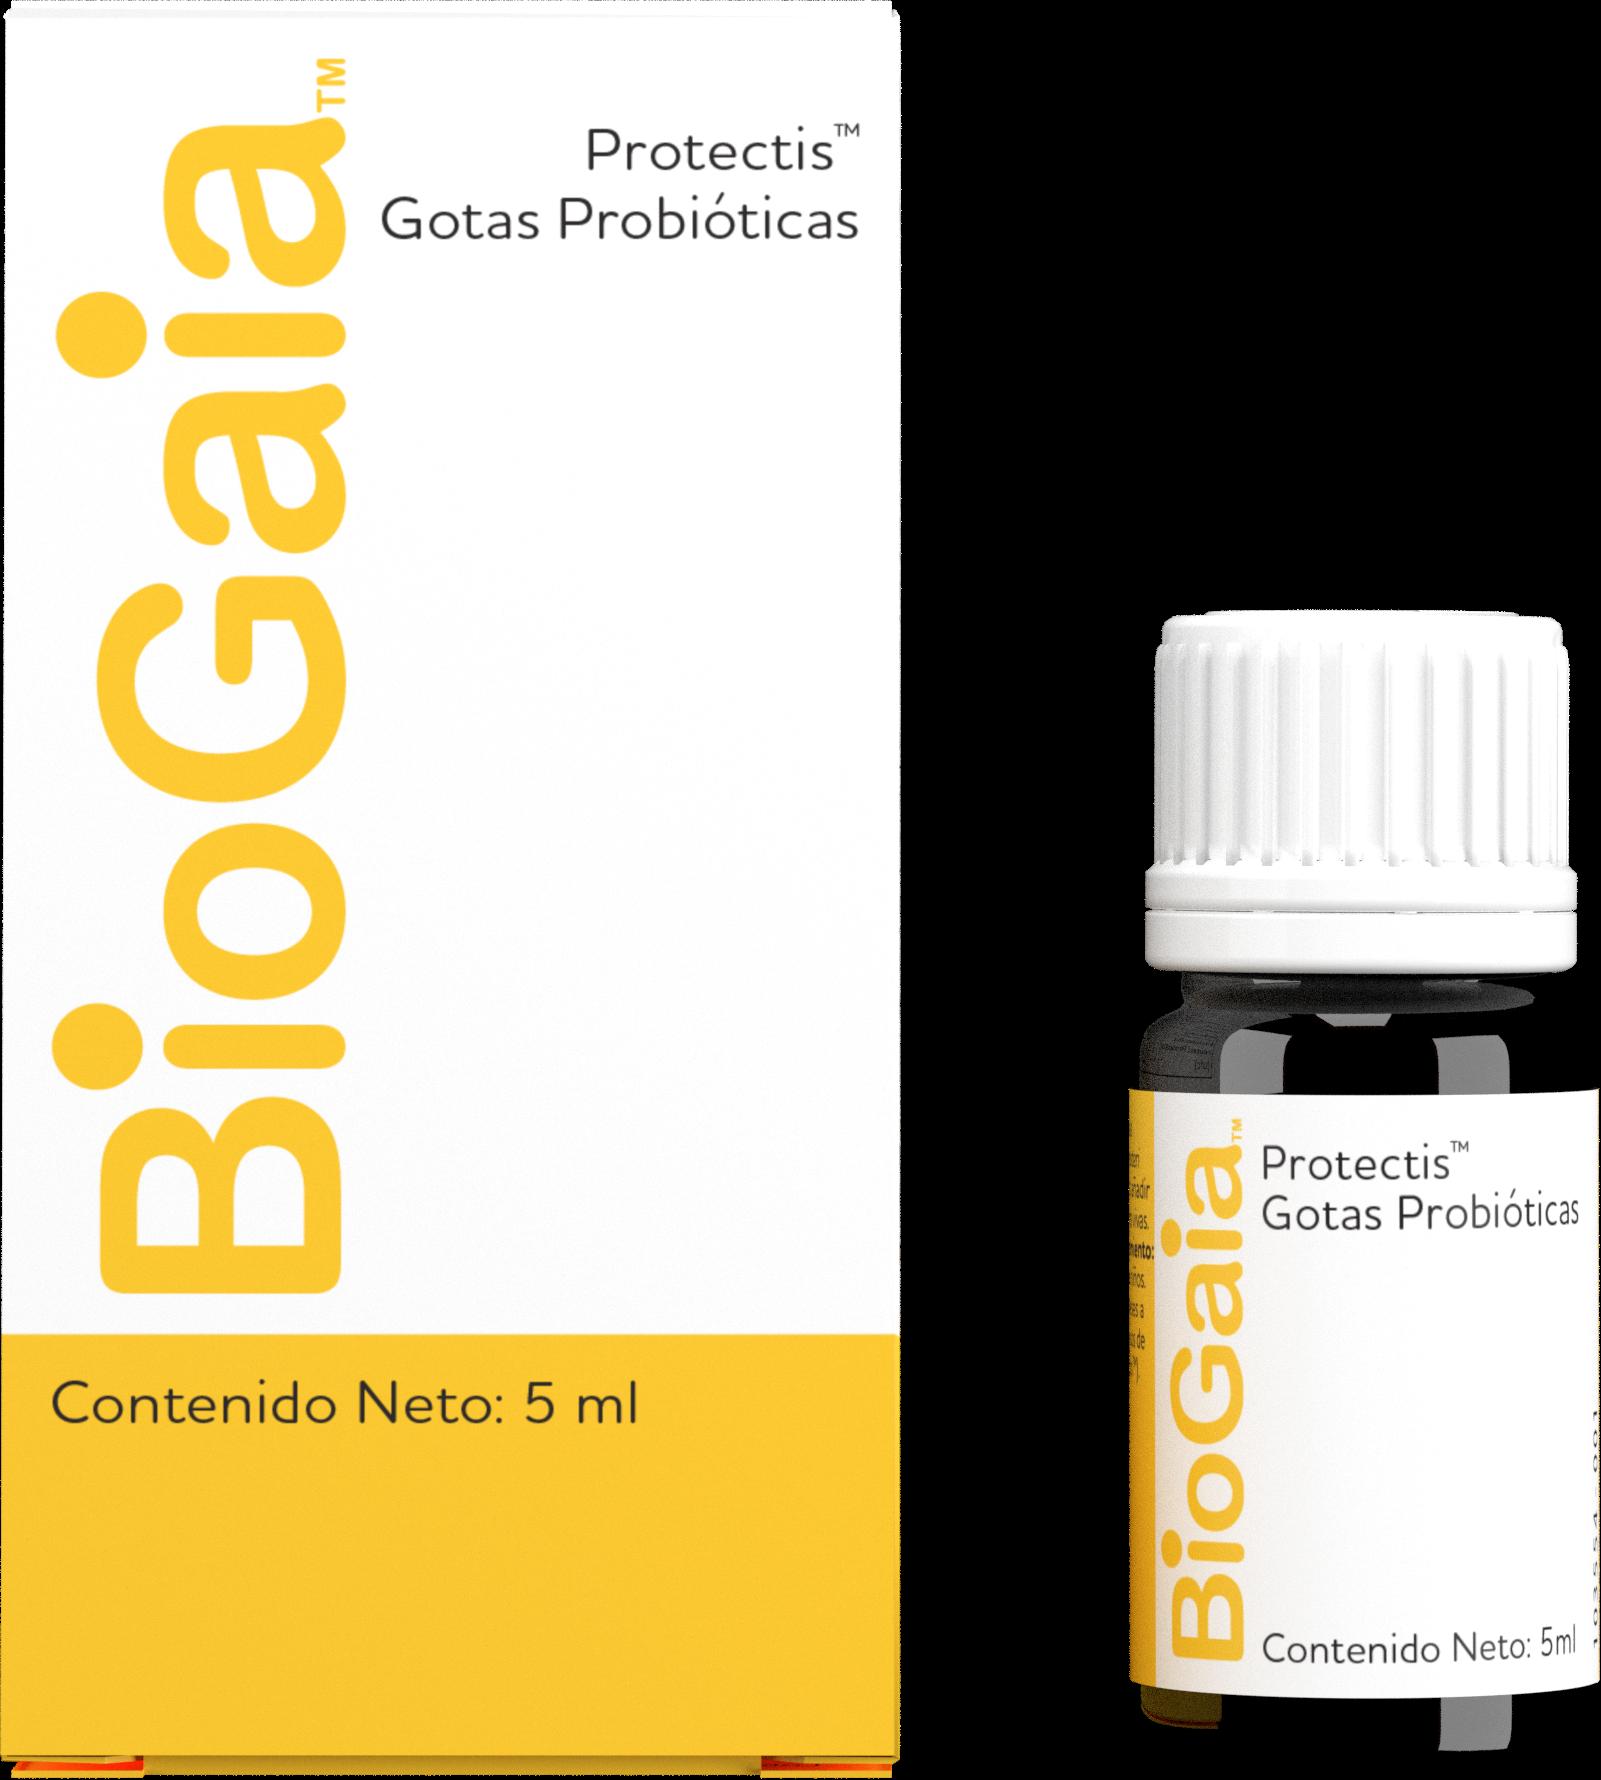 BioGaia Protectis probiotic drops Uruguay